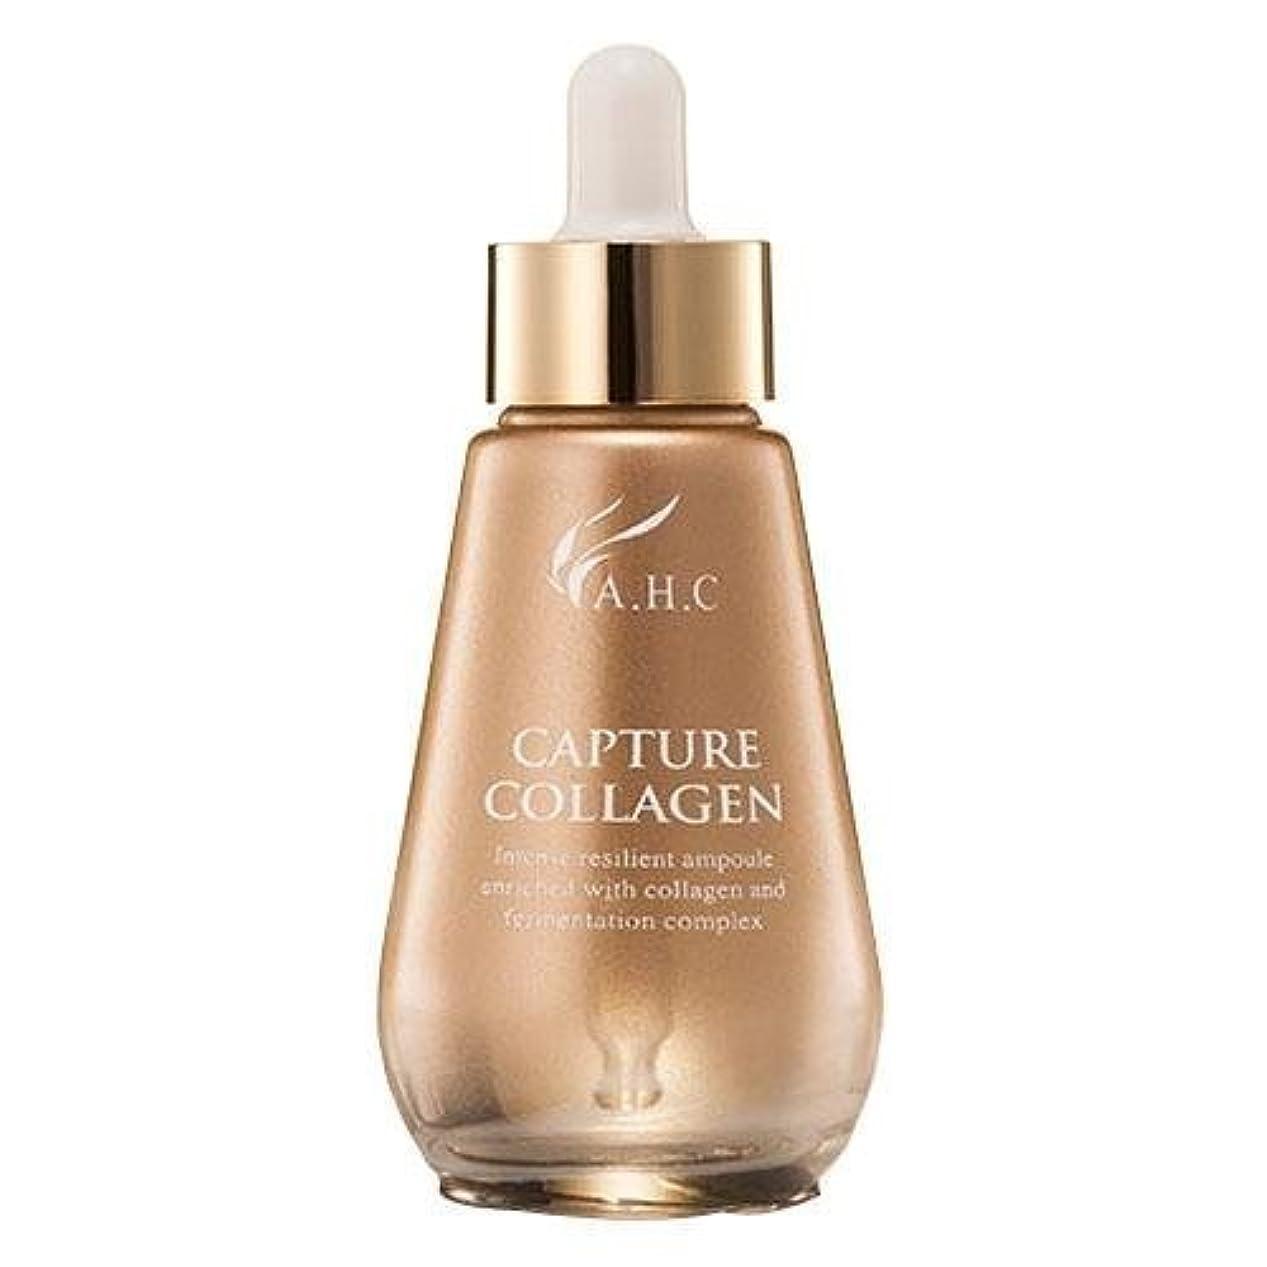 A.H.C Capture Collagen Ampoule/ Made in Korea